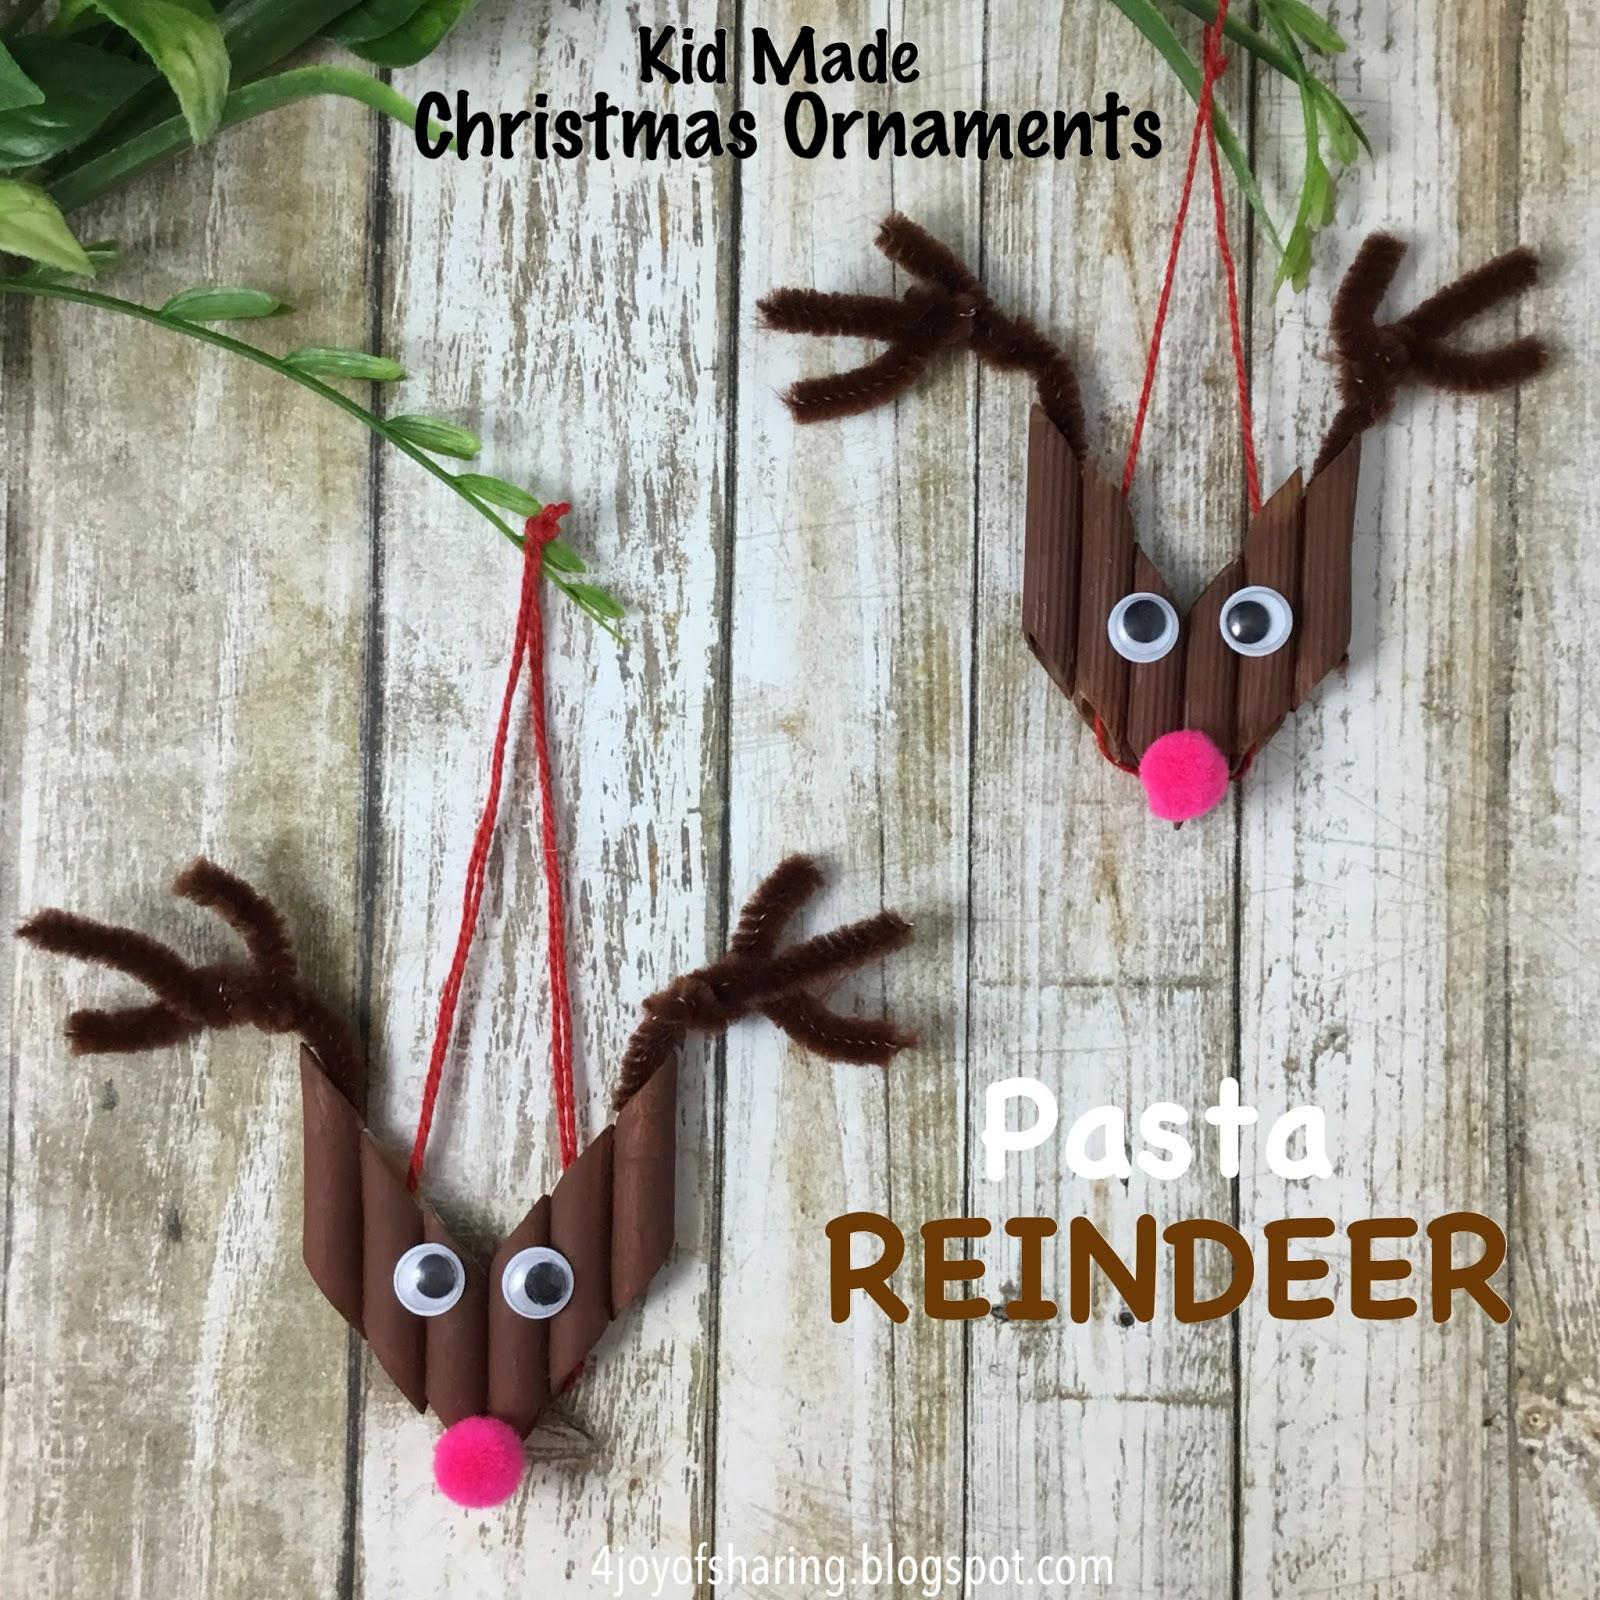 The Joy Of Sharing: Pasta Reindeer Christmas Ornament